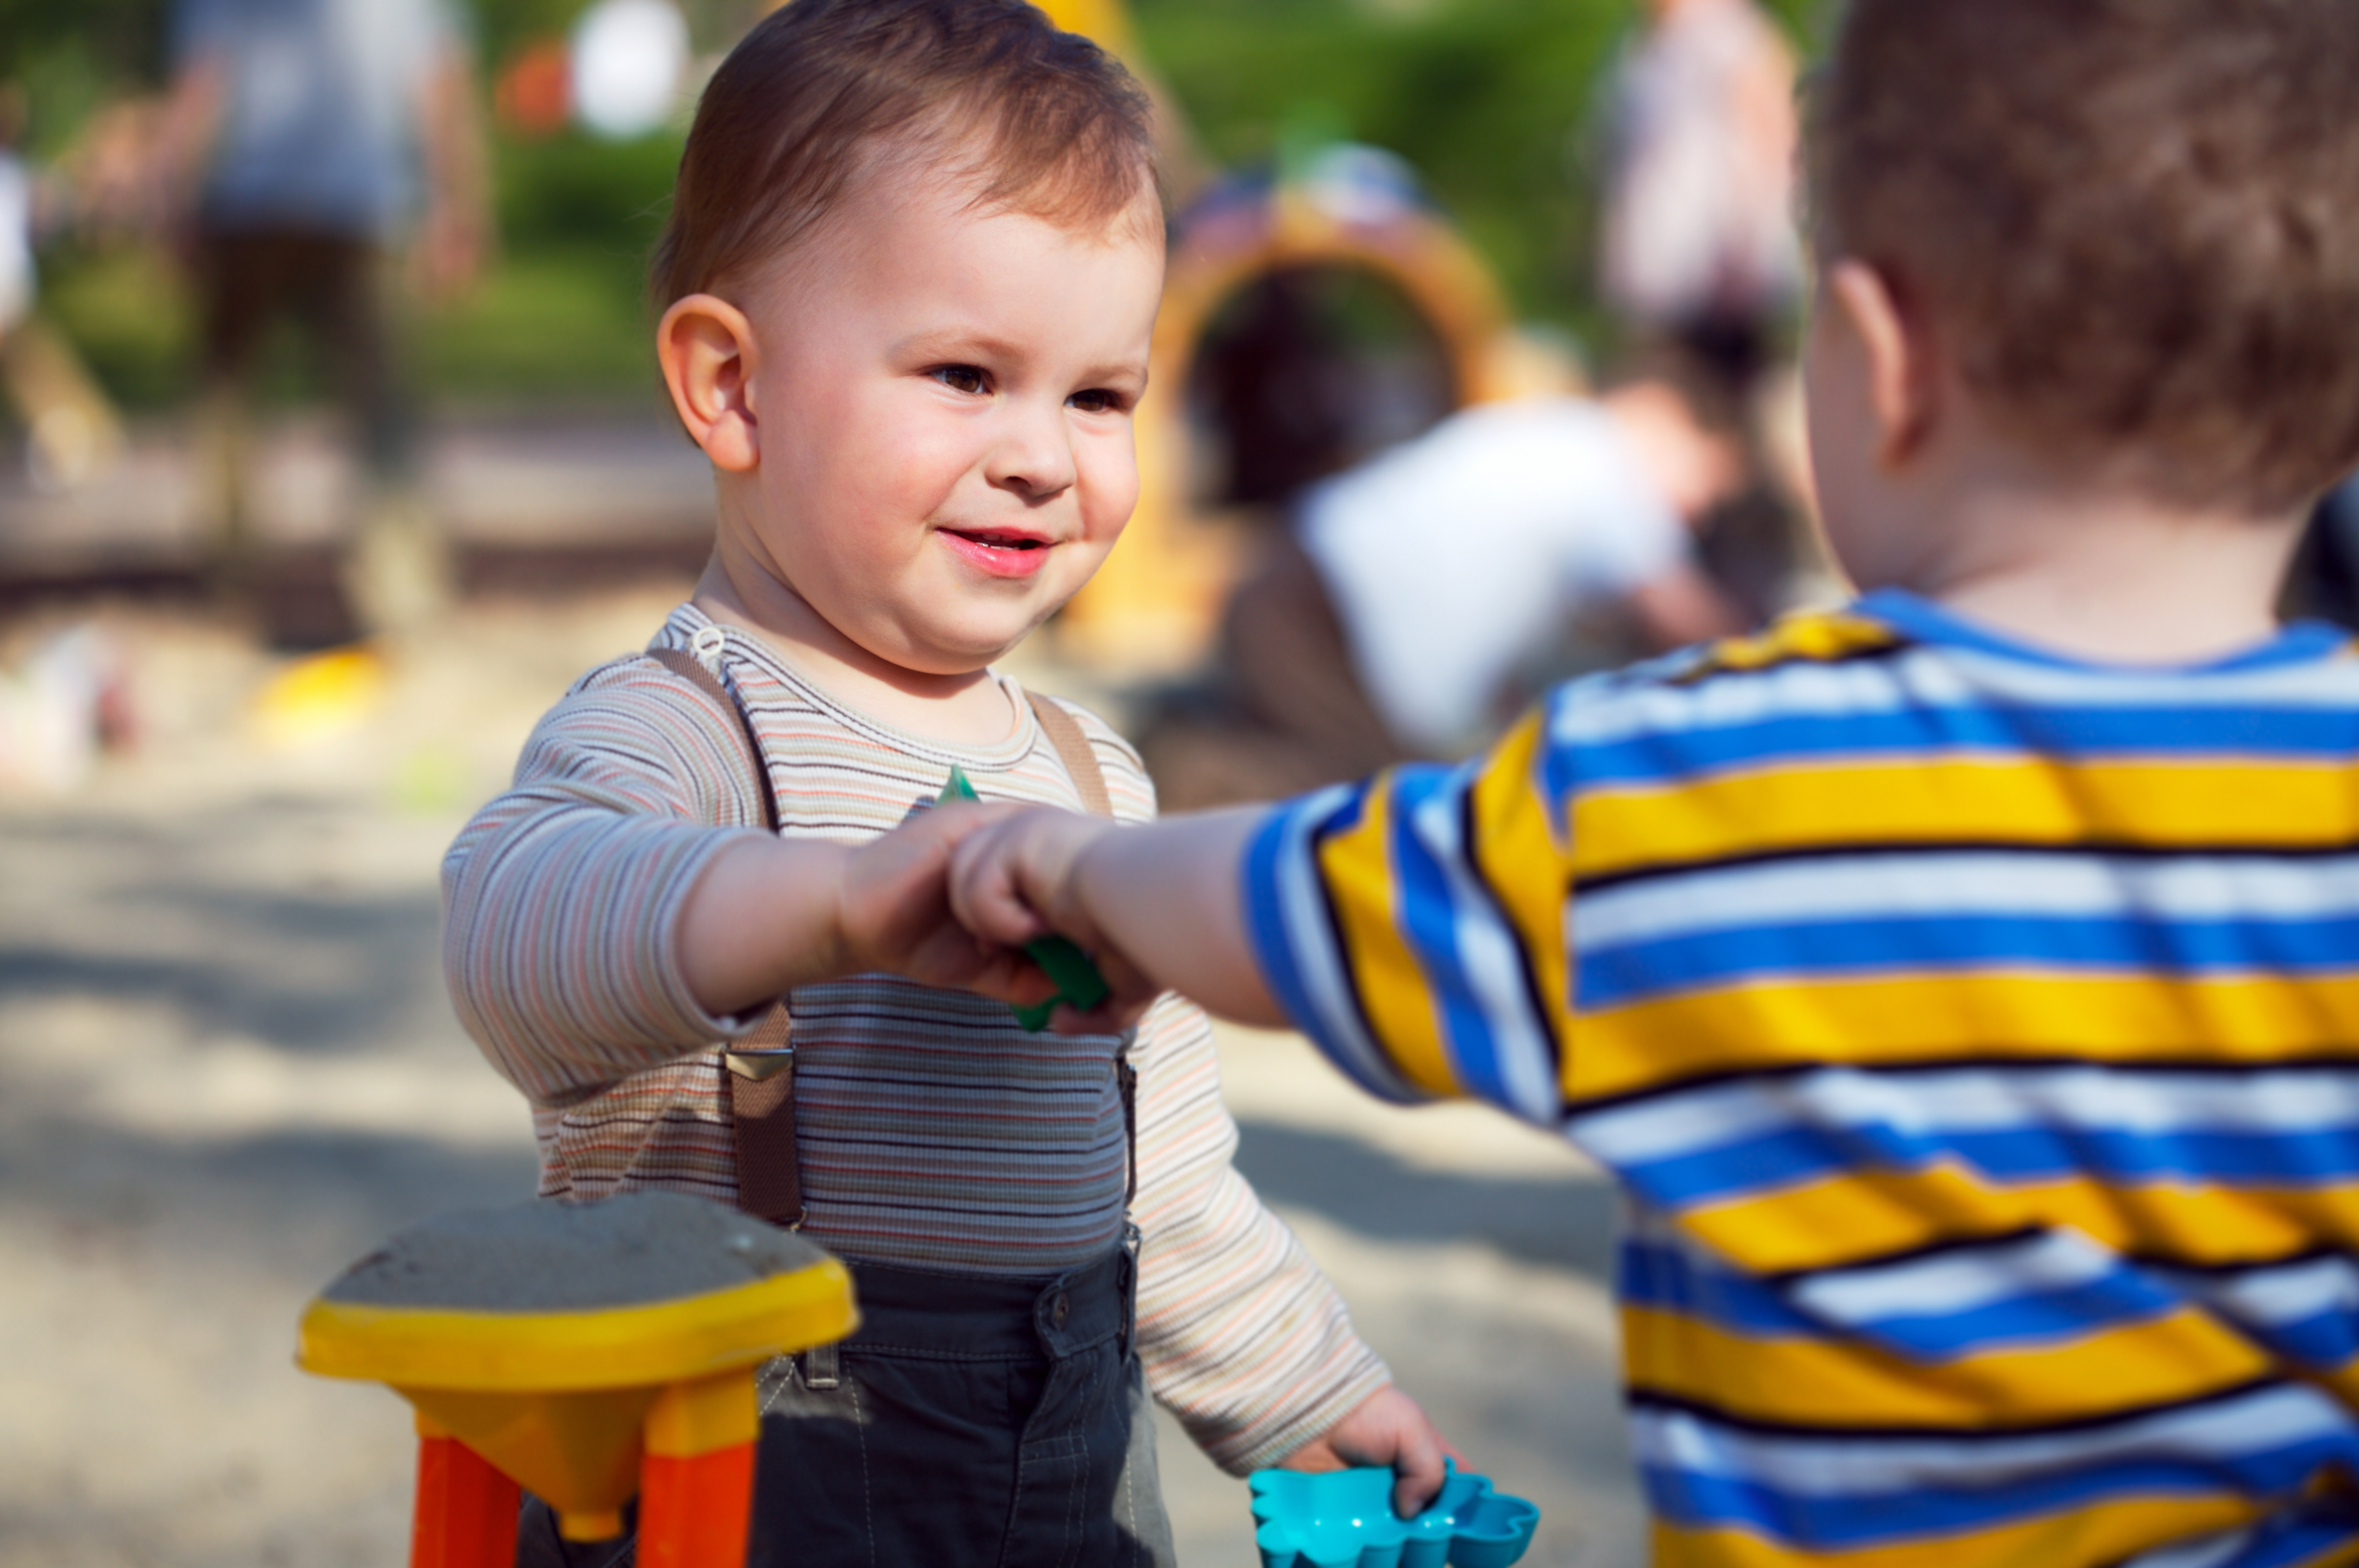 Foto: © iStock.com/nyul